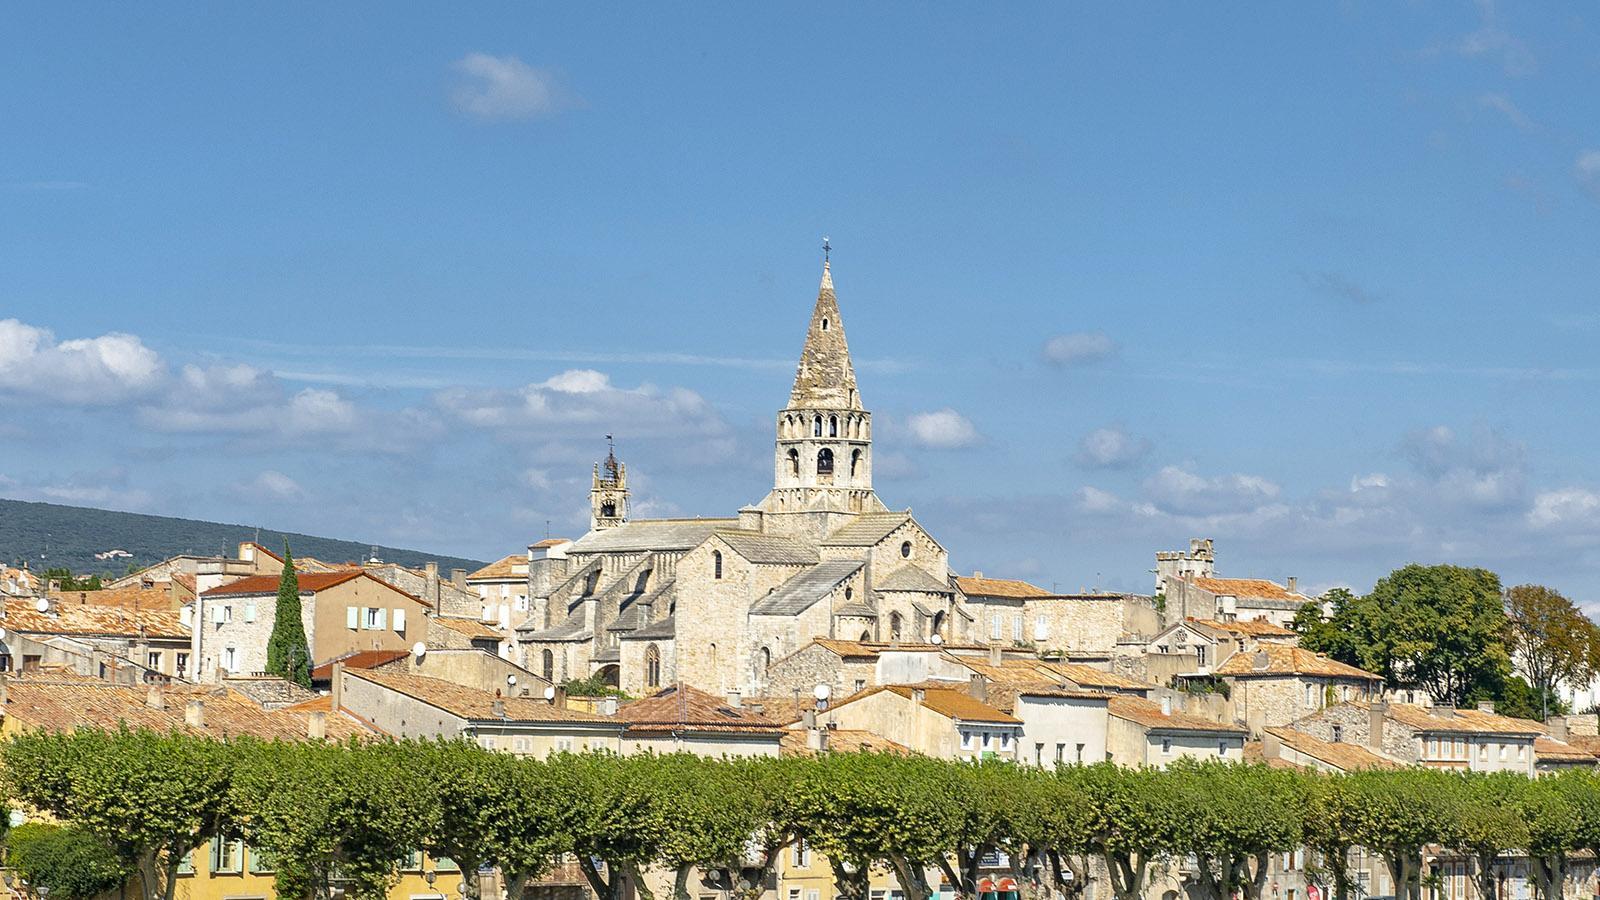 Voller Charme: Bourg Saint-Andéol am rechten Ufer der Rhône. Foto: Hilke Maunder